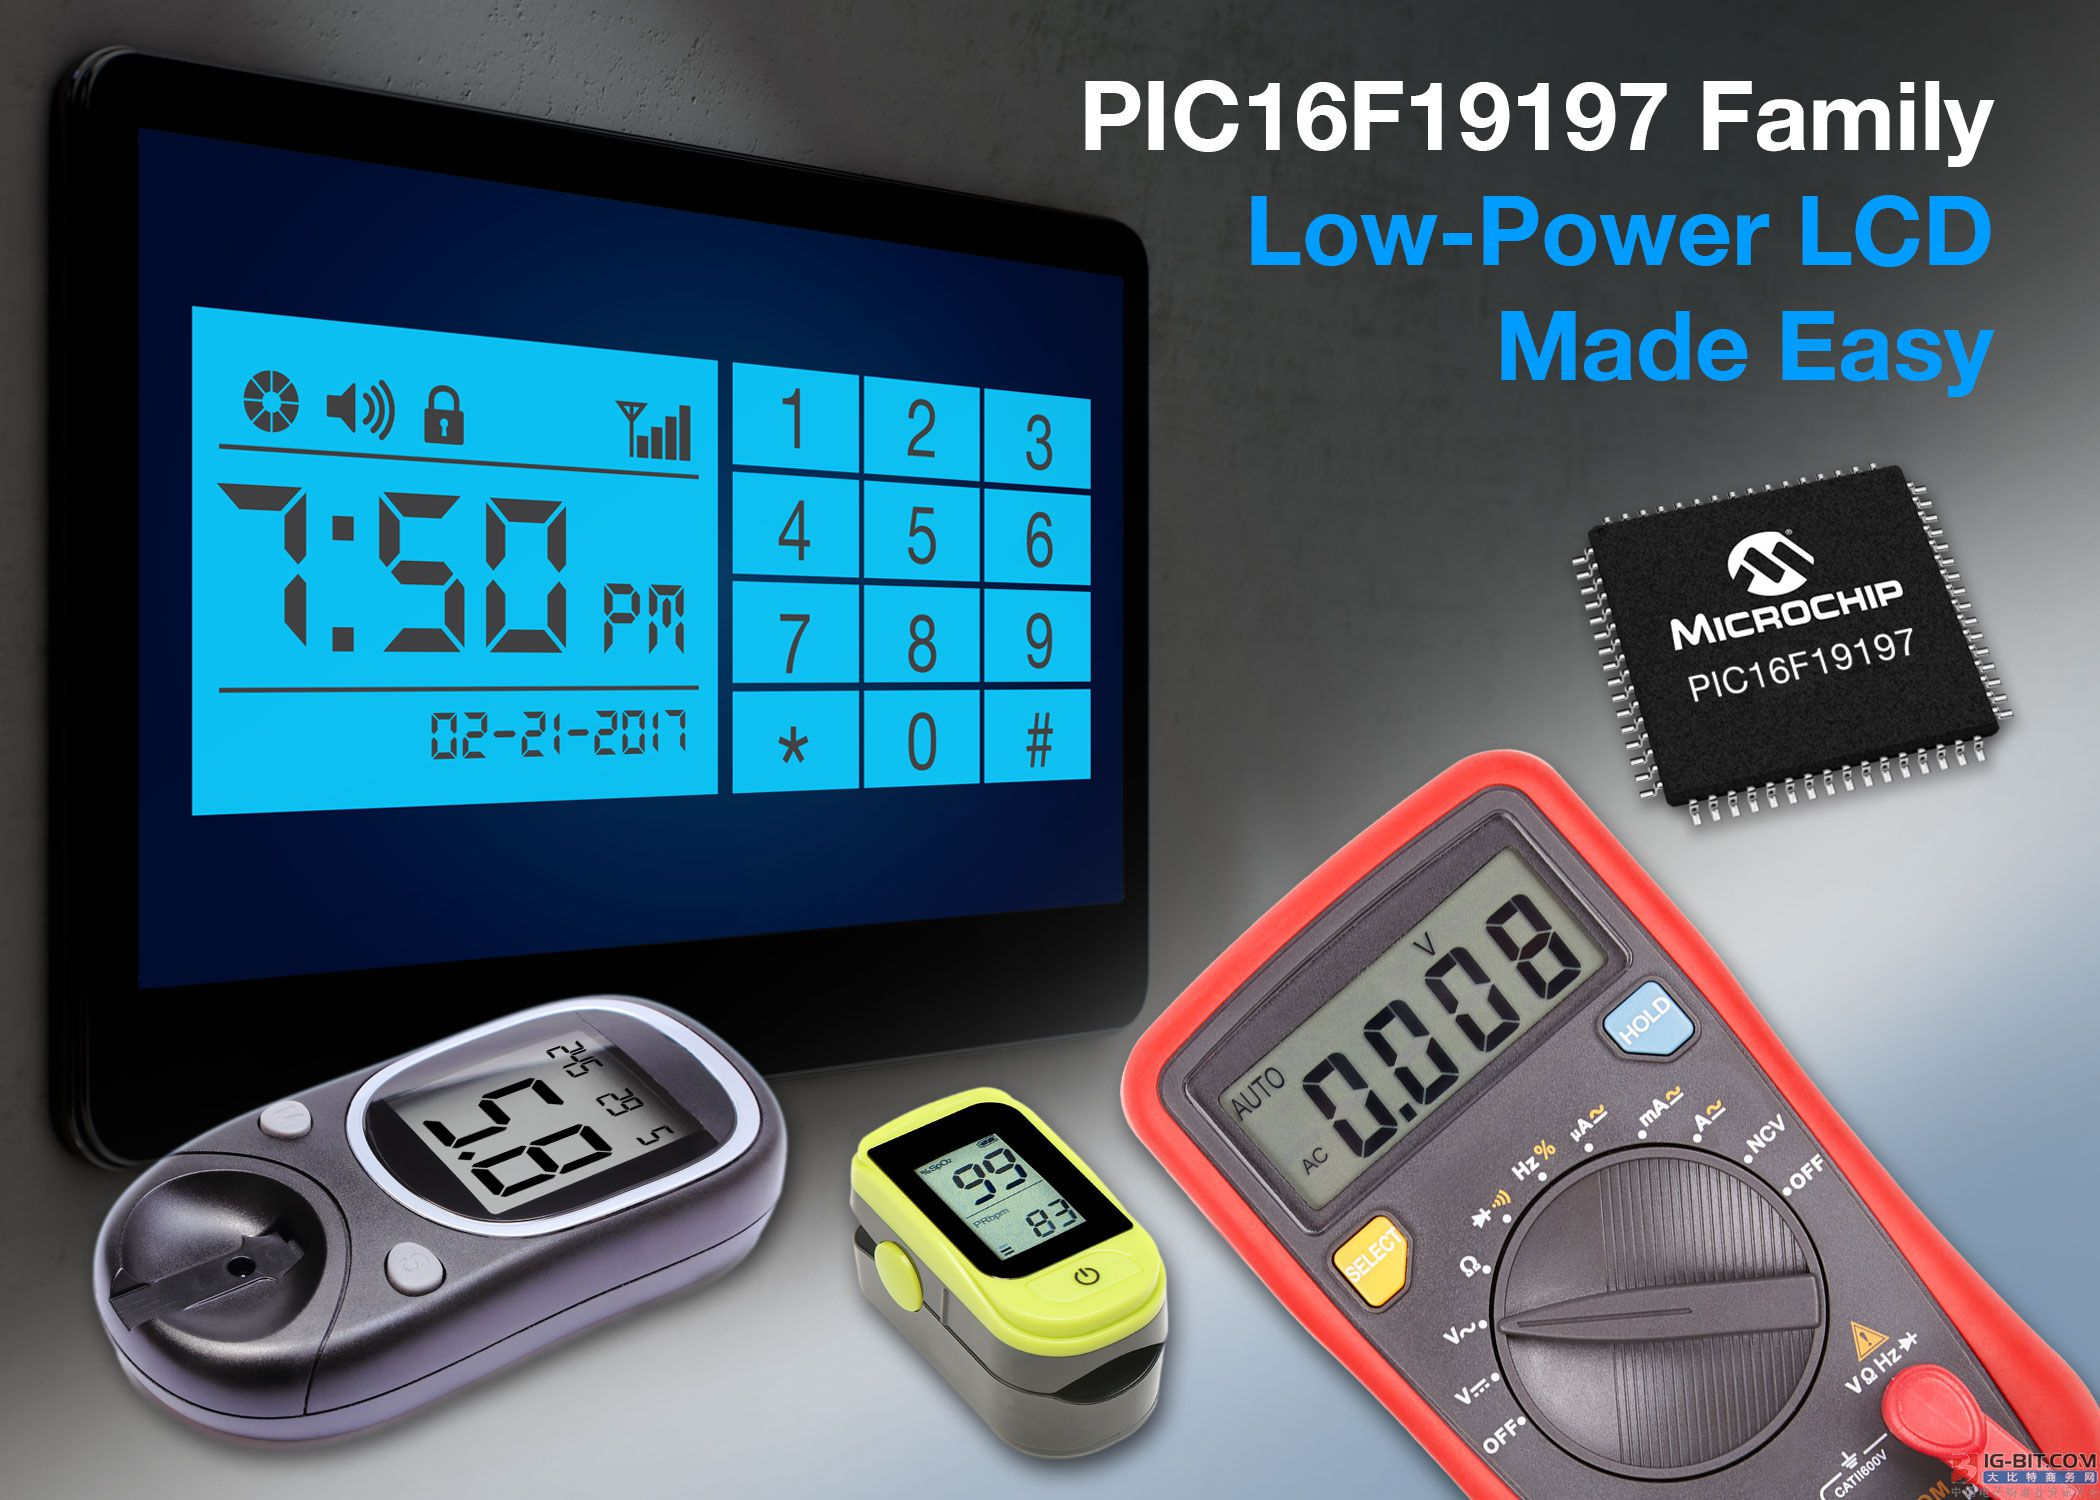 Microchip 推出新型MCU简化低功耗LCD应用设计 PIC16F19197单片机系列集成了电池友好型LCD驱动、